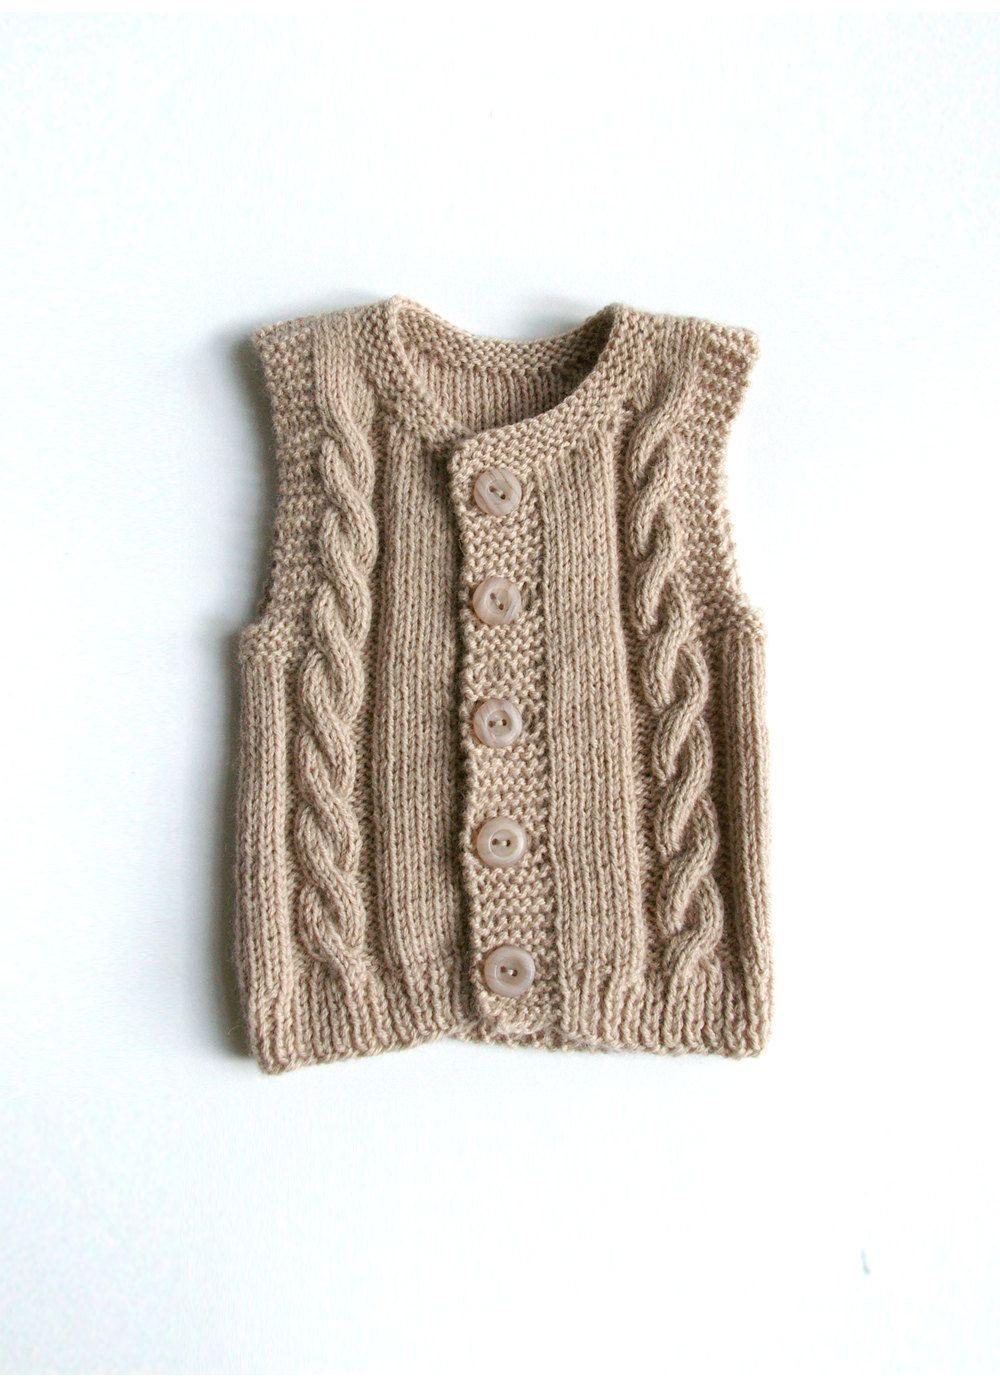 Knitted baby vest. | dos agujas | Pinterest | Ärmellose weste ...